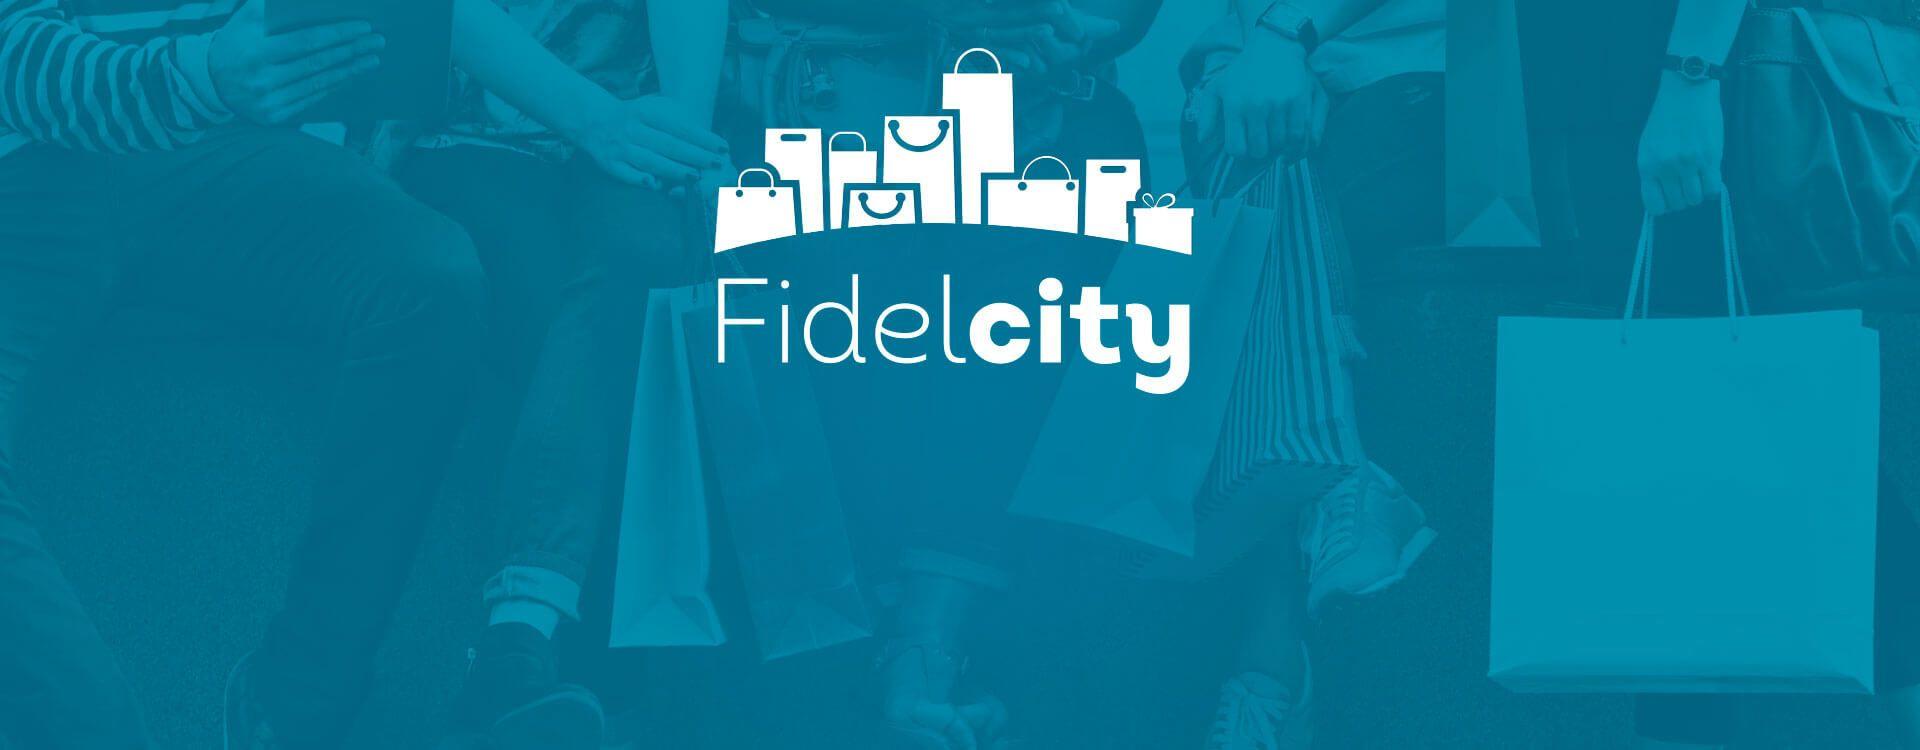 FidelCity